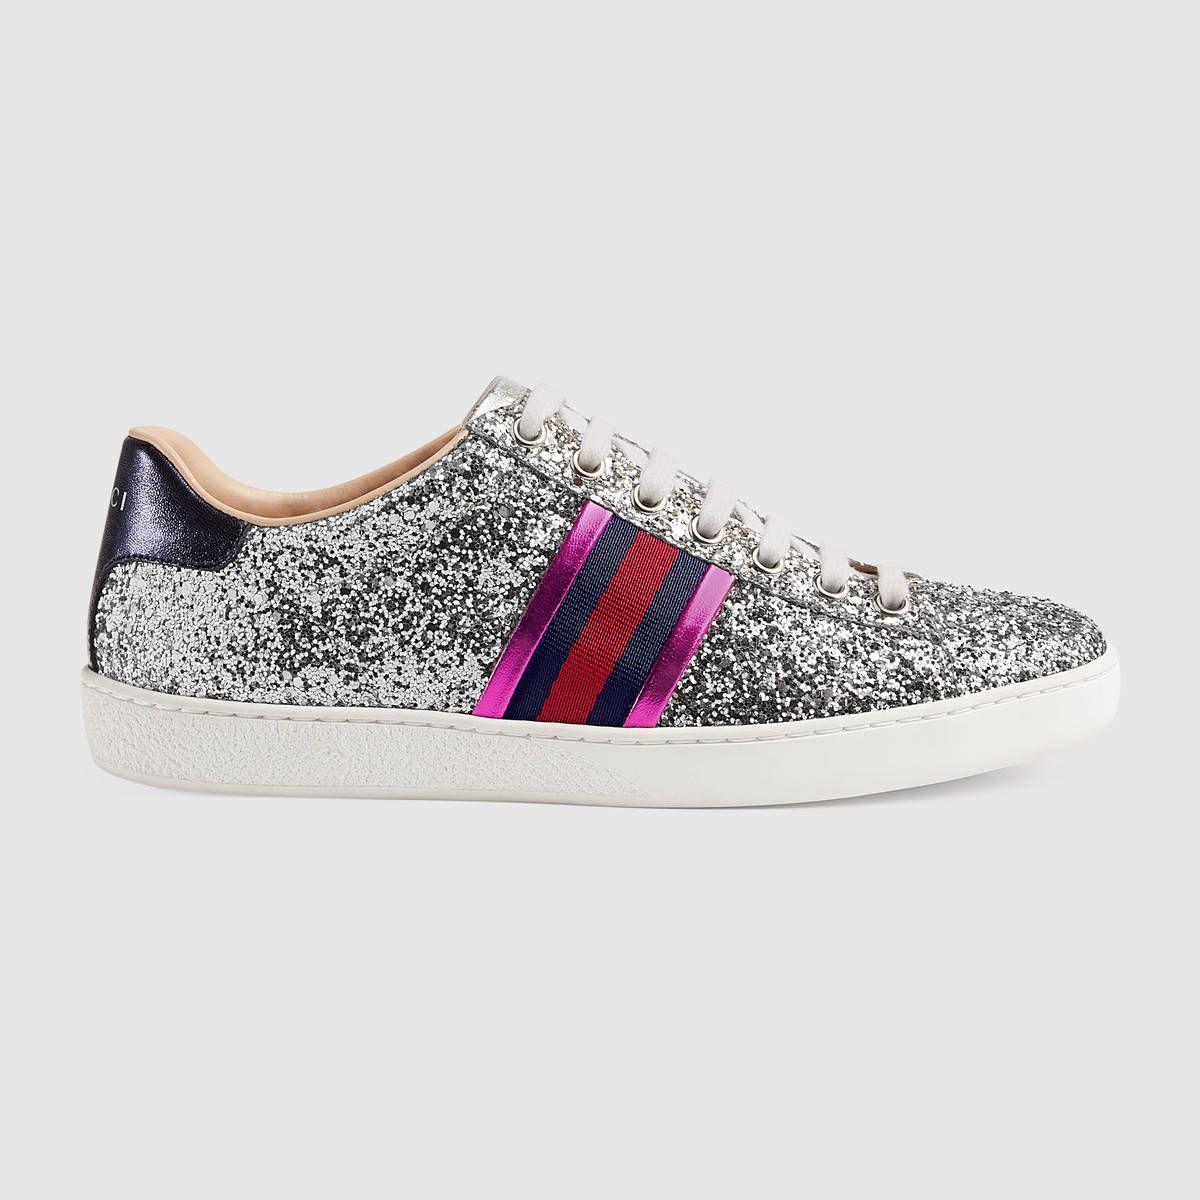 Gucci Ace glitter sneaker  5593bad5a